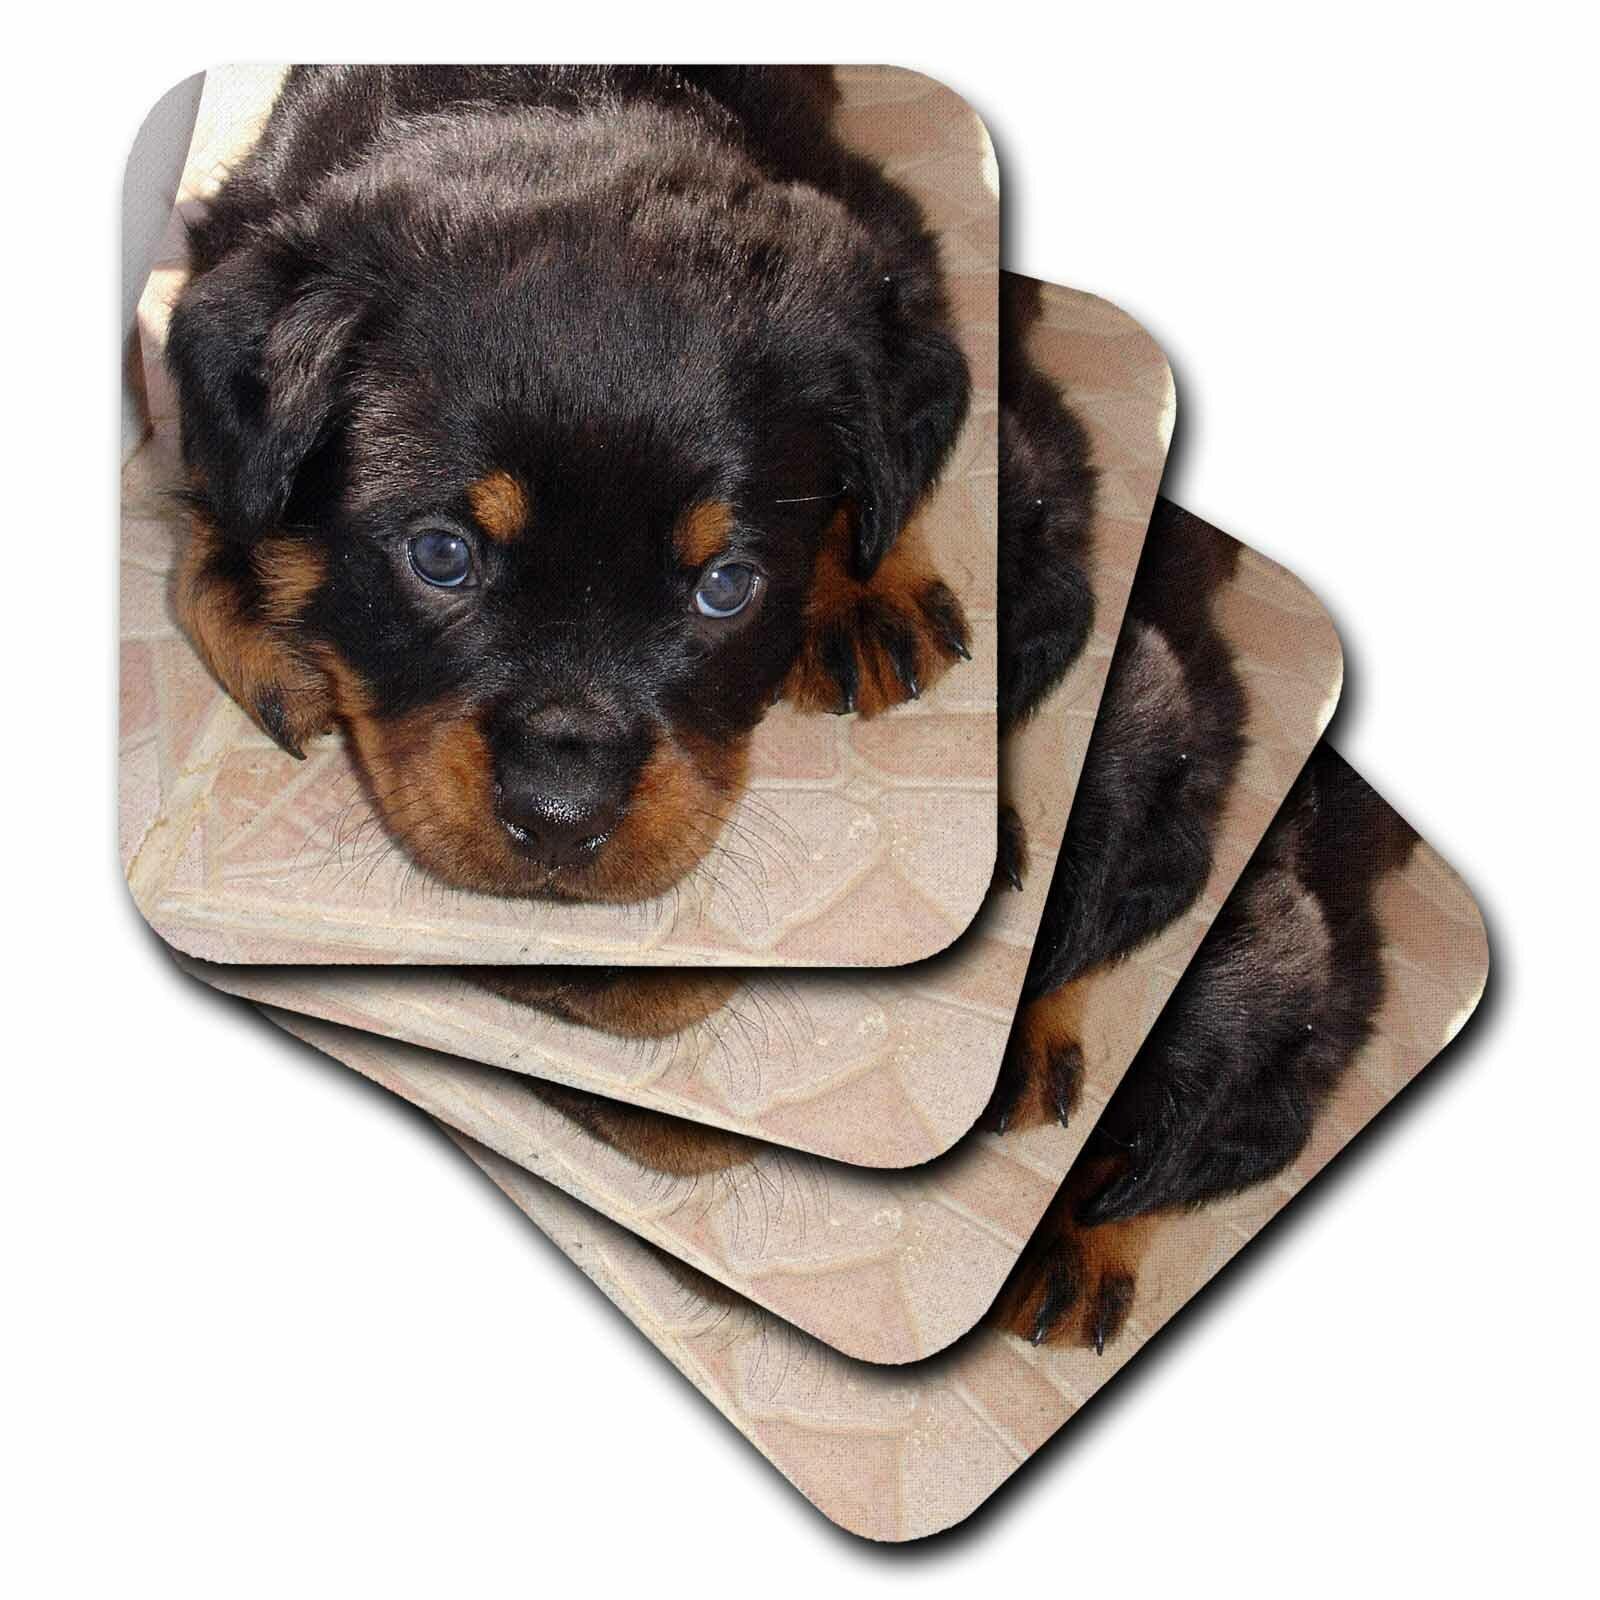 3drose Ceramic Tile Coasters Dog Rottweiler Puppy Set Of 4 Cst 17676 3 Wayfair